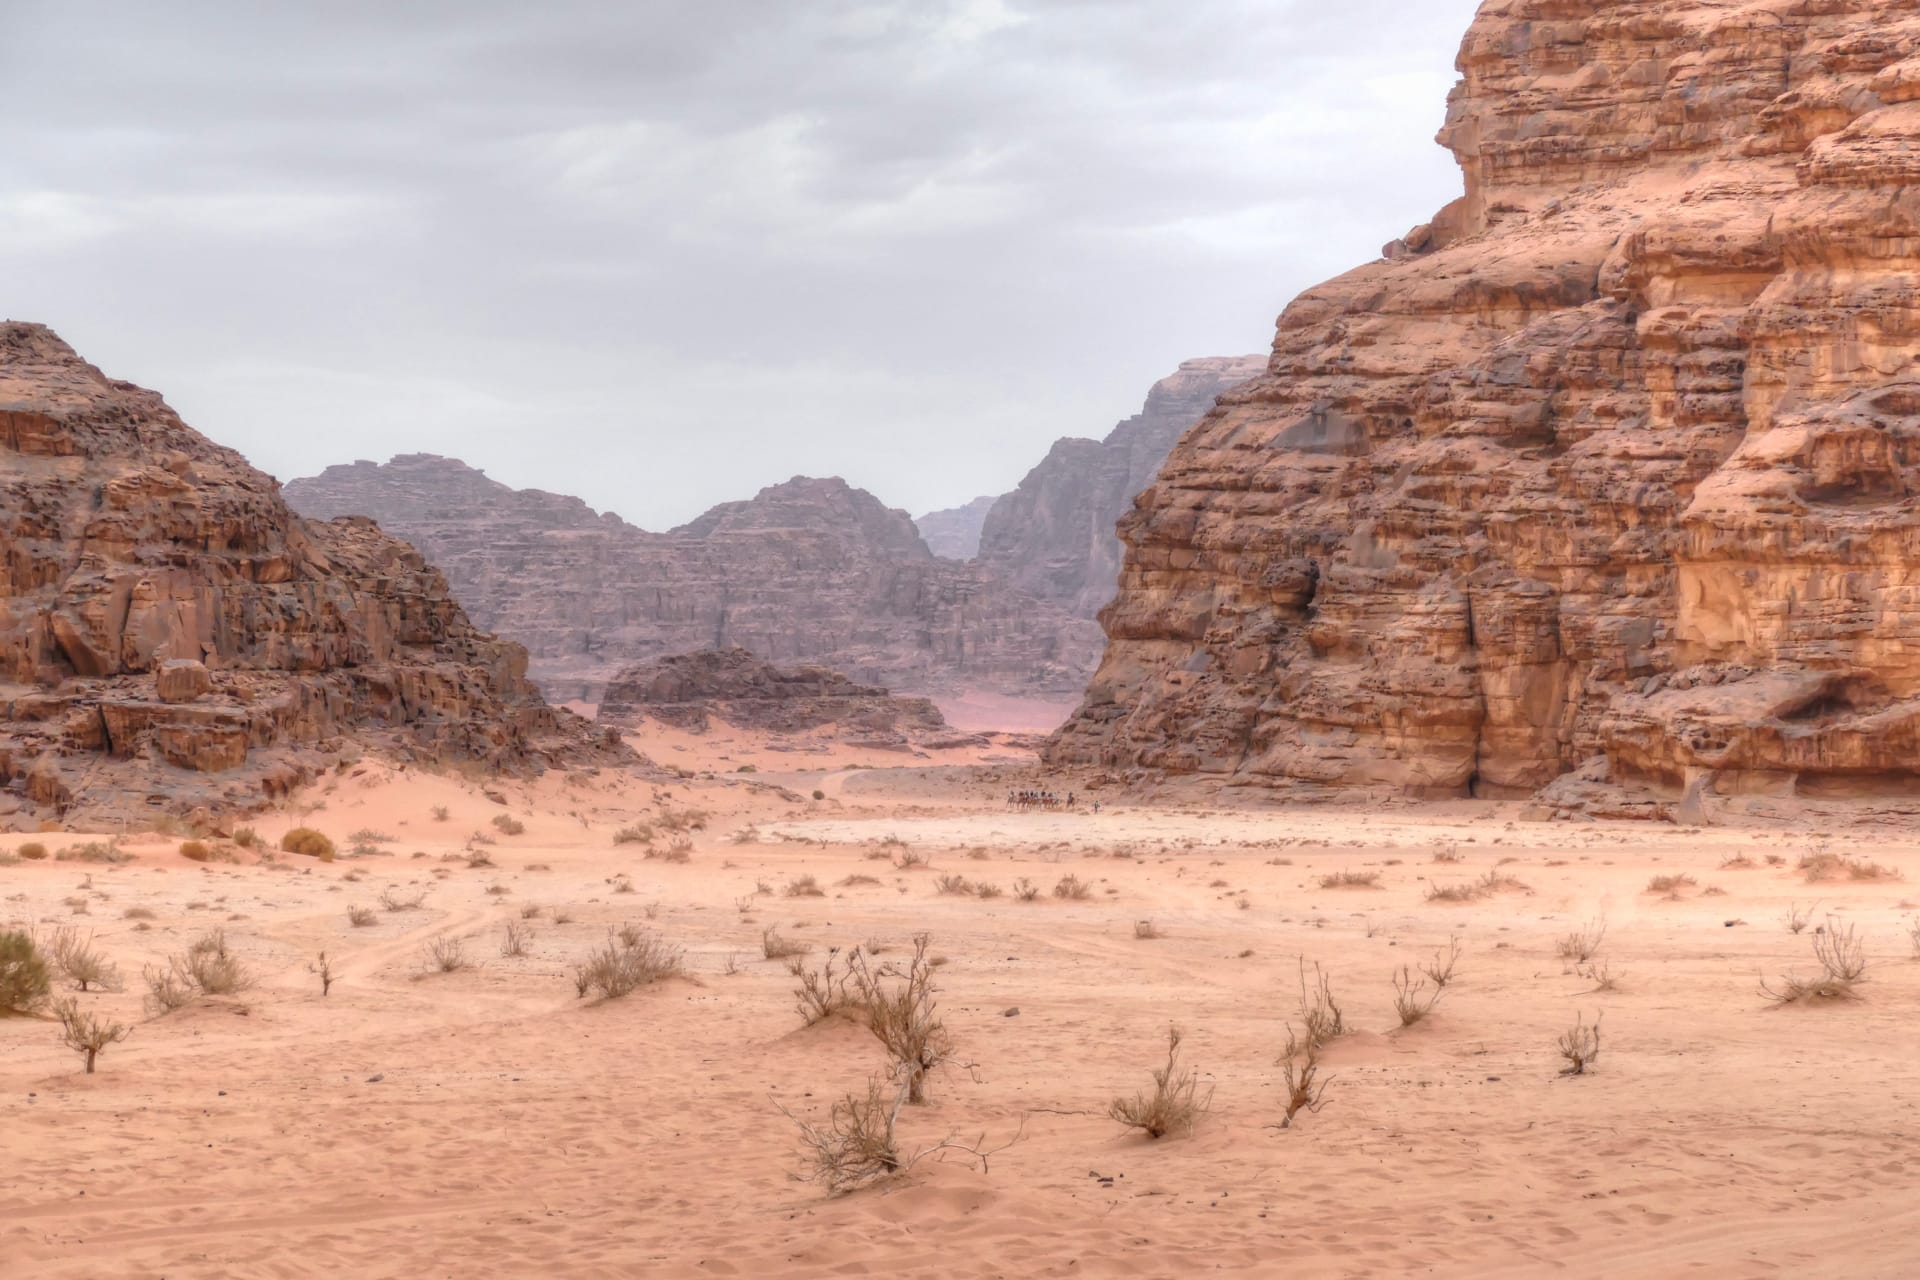 Why visit Wadi Rum